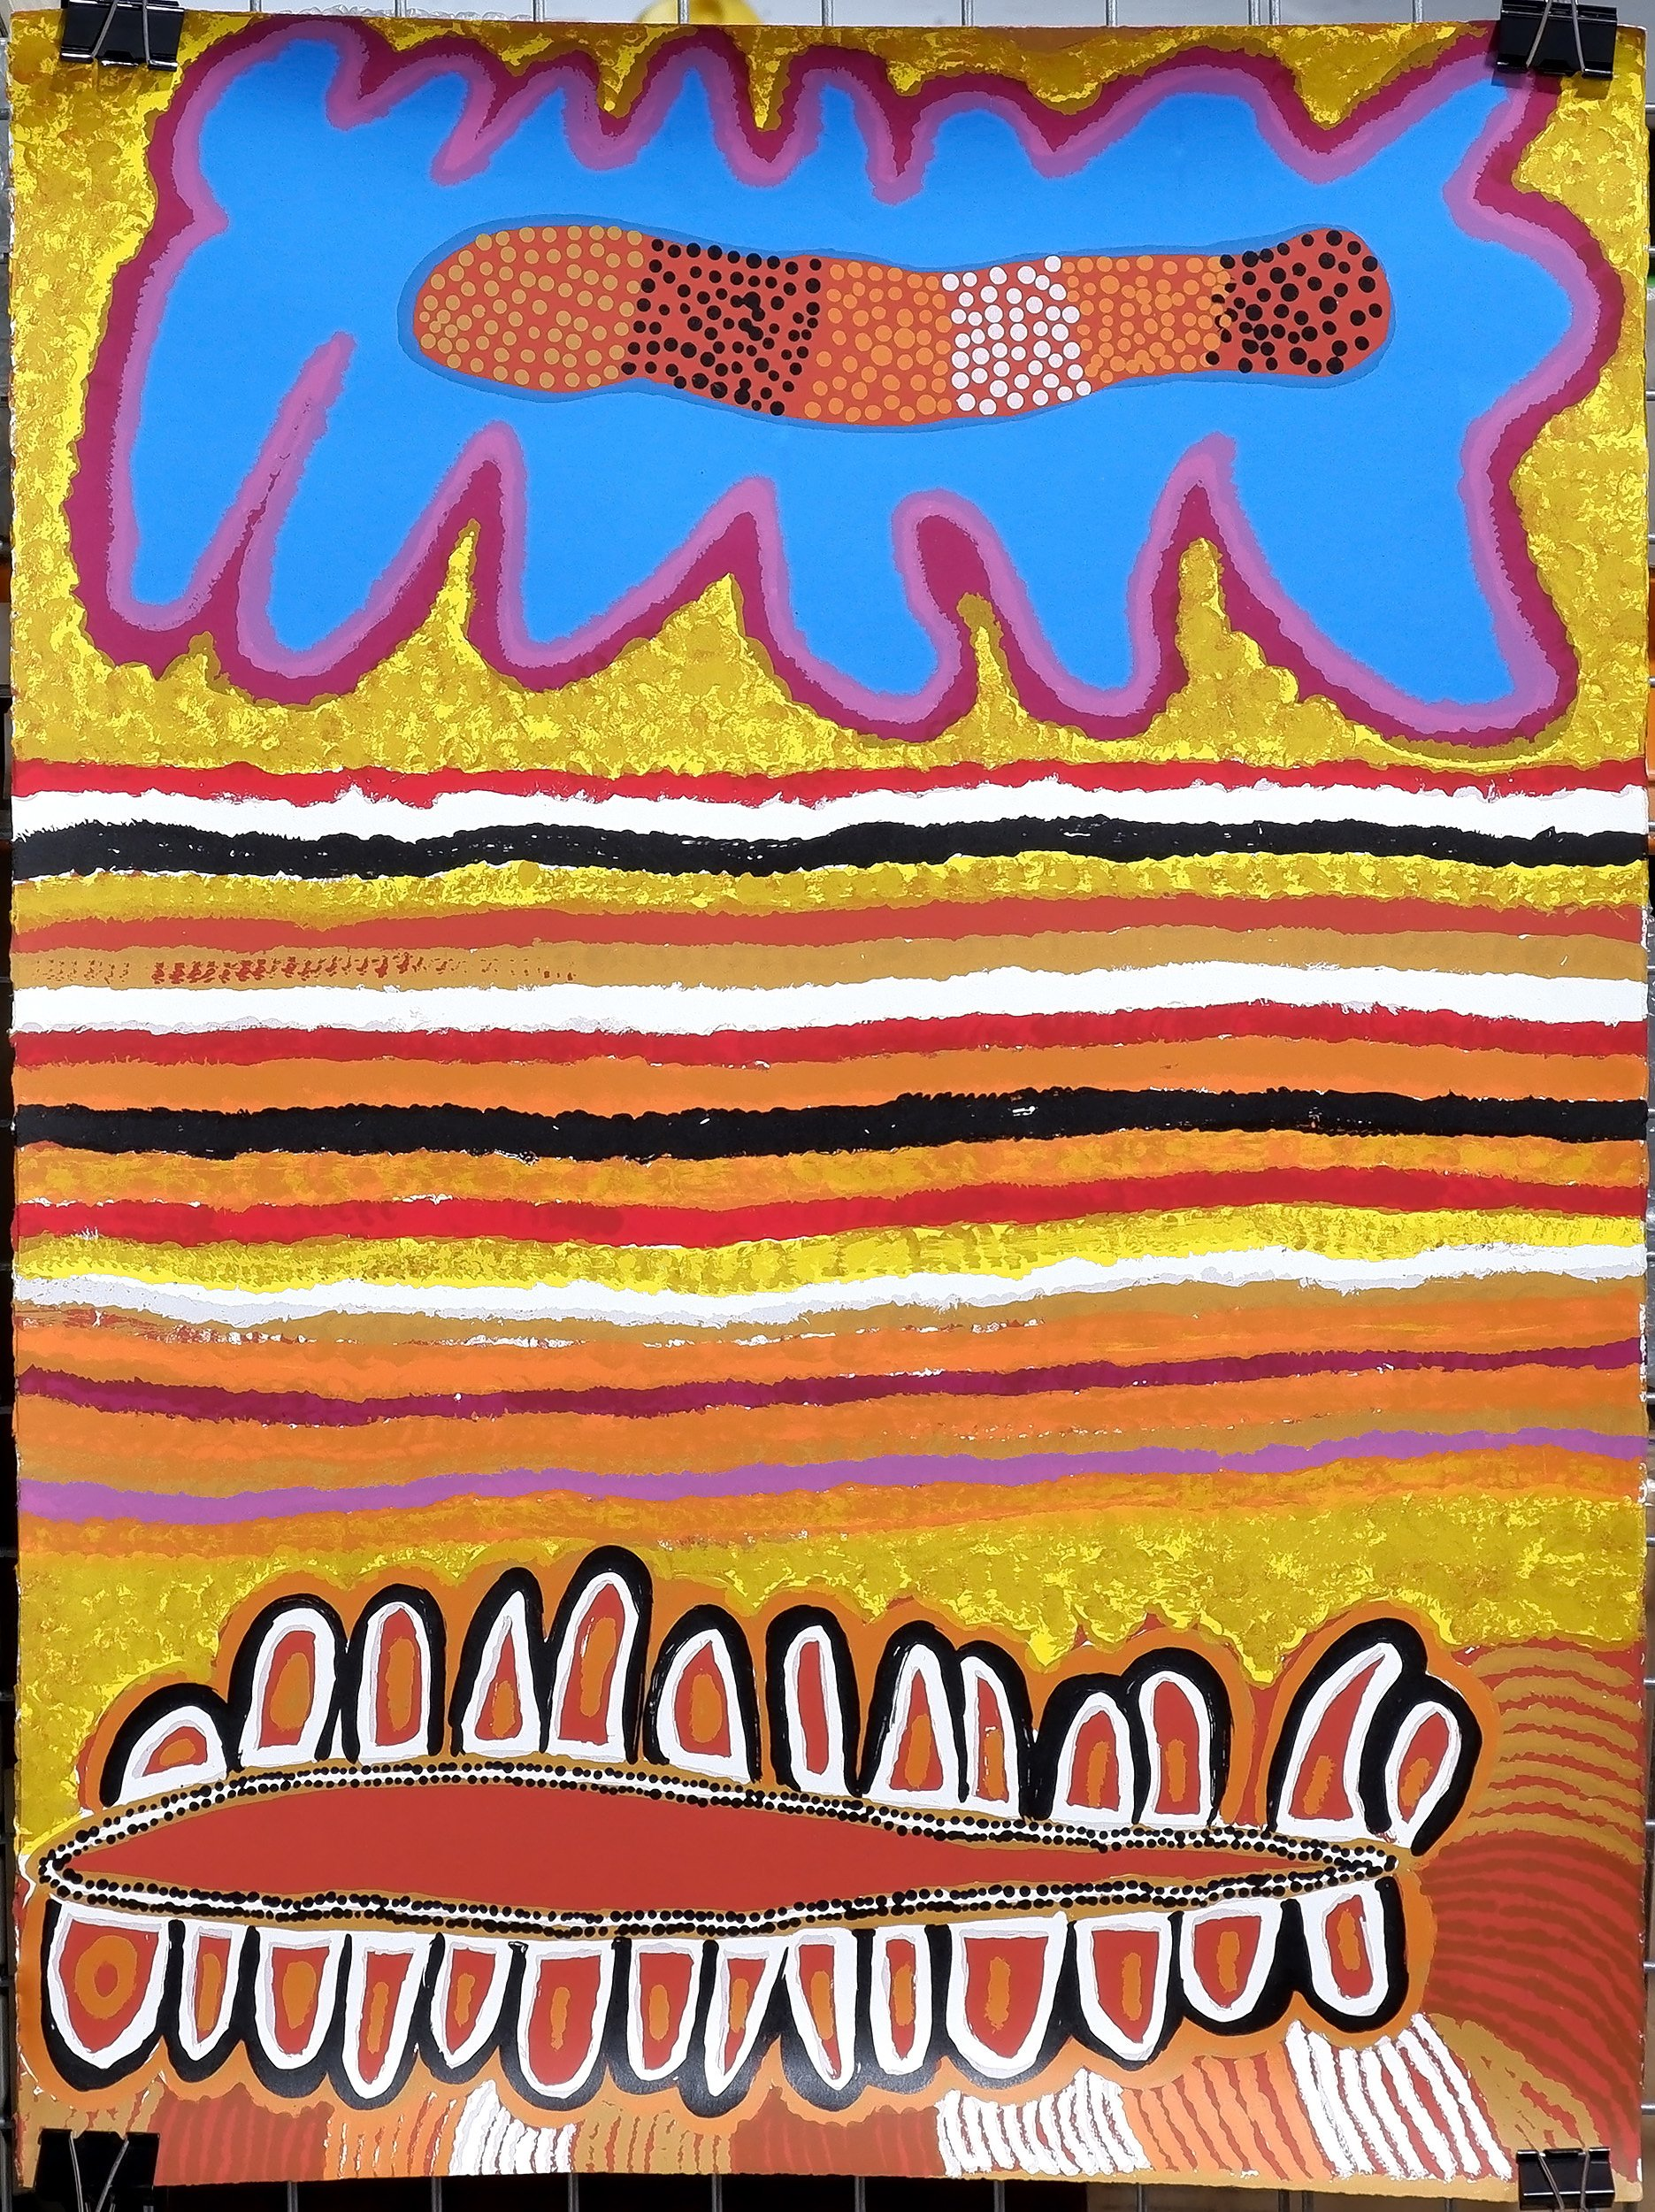 'Attributed to Susie Bootja Bootja Napaltjarri (1935-2003) Acrylic on Paper 1999, Unframed'